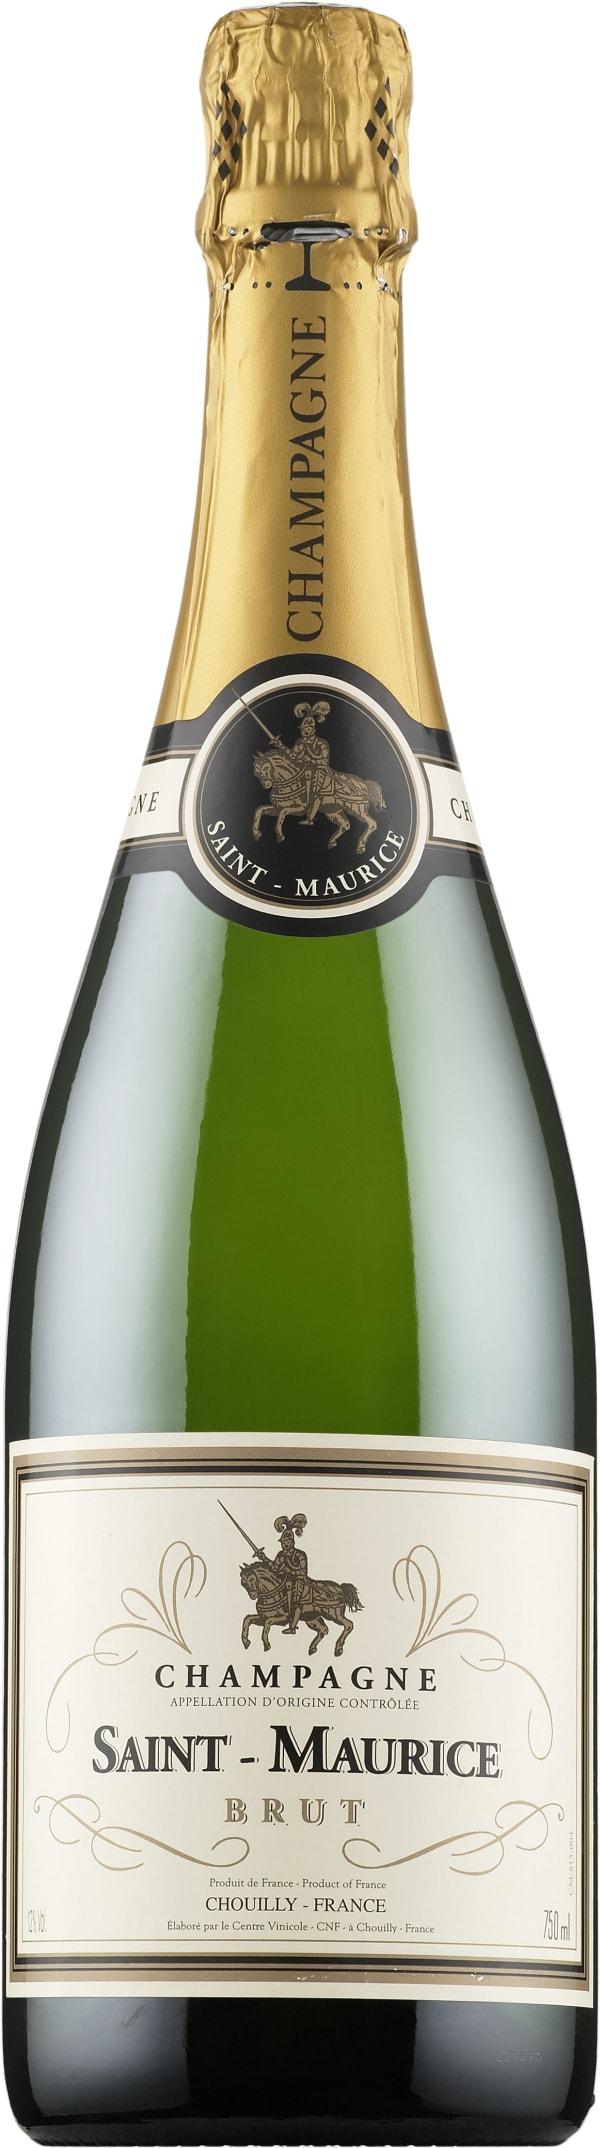 Saint-Maurice Champagne Brut